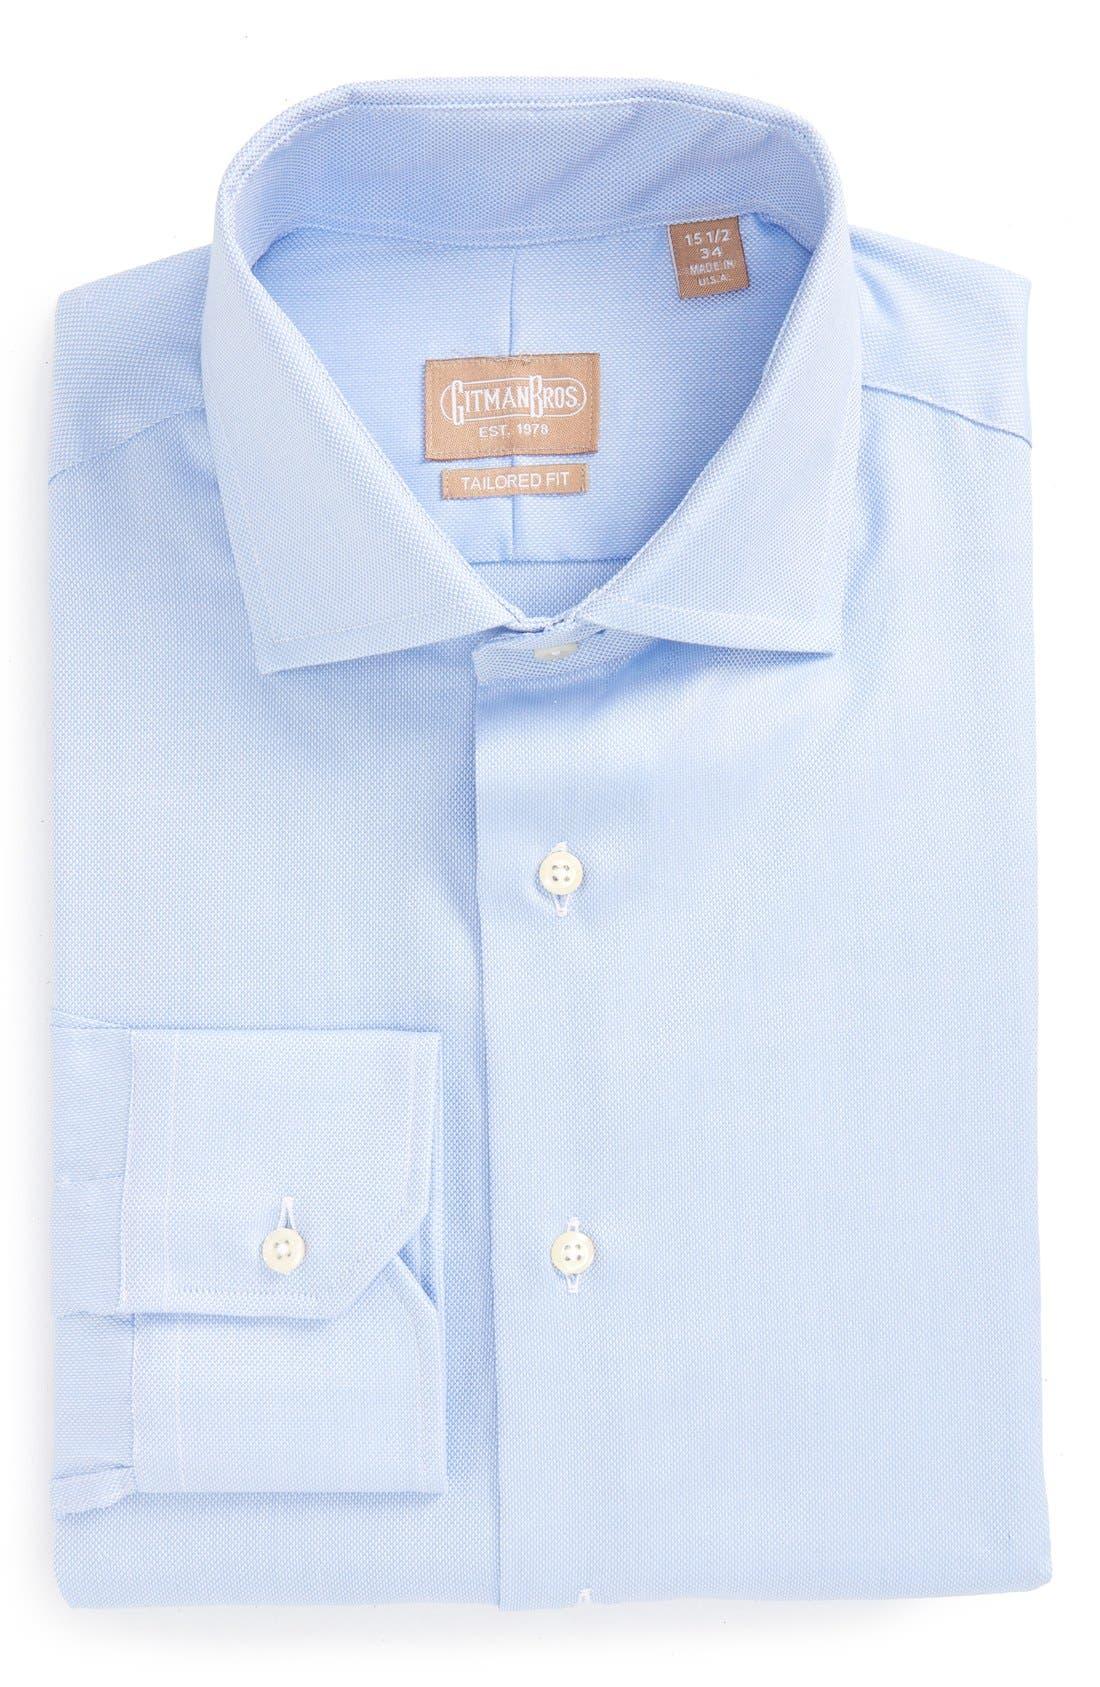 GITMAN Royal Oxford Tailored Fit Dress Shirt